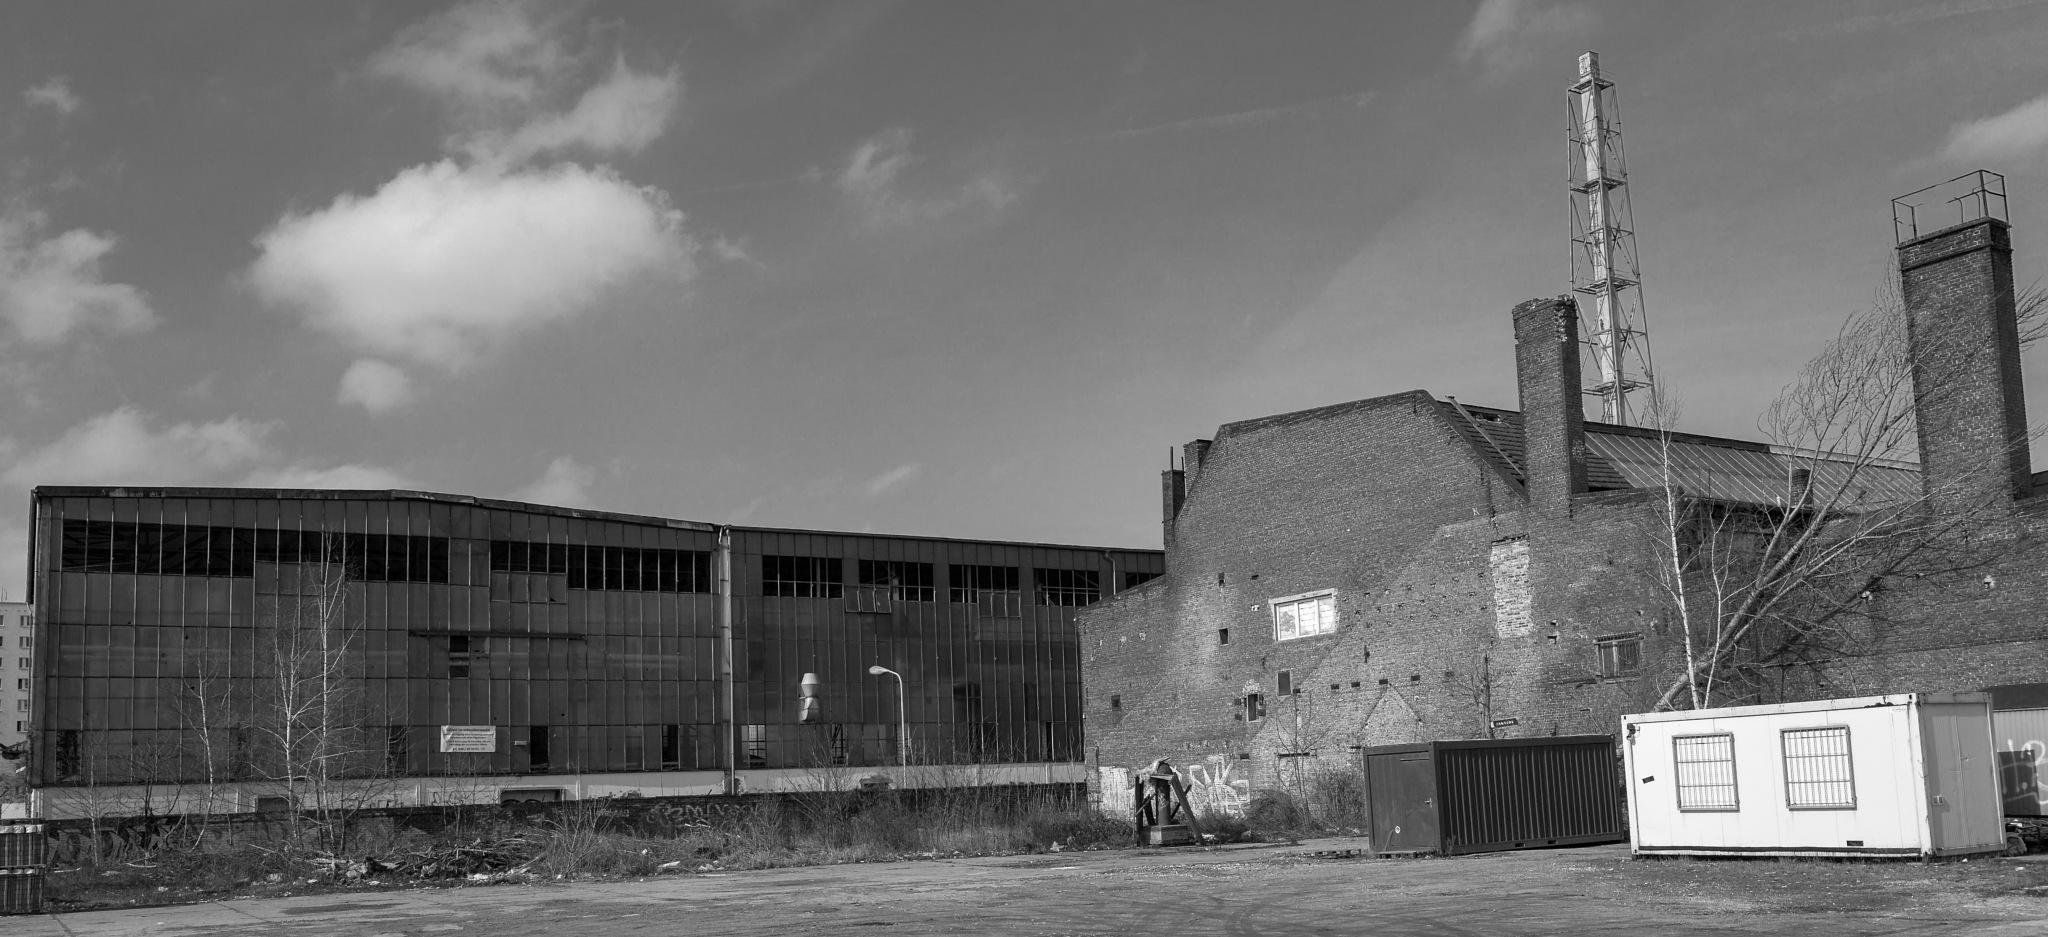 Warehouse by Dro_B